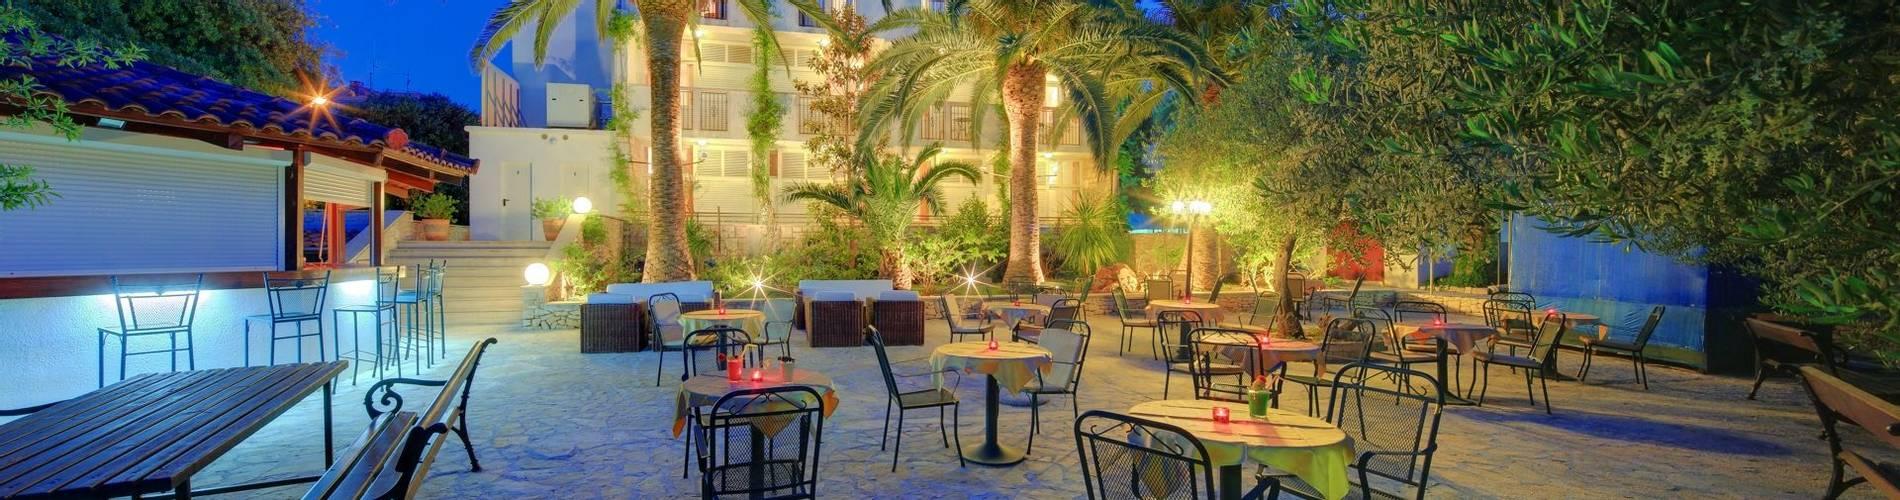 Hotel Villa ADRIATICA 2014 ZFacade Garden Night1 19X9 panorama 30MB.jpg